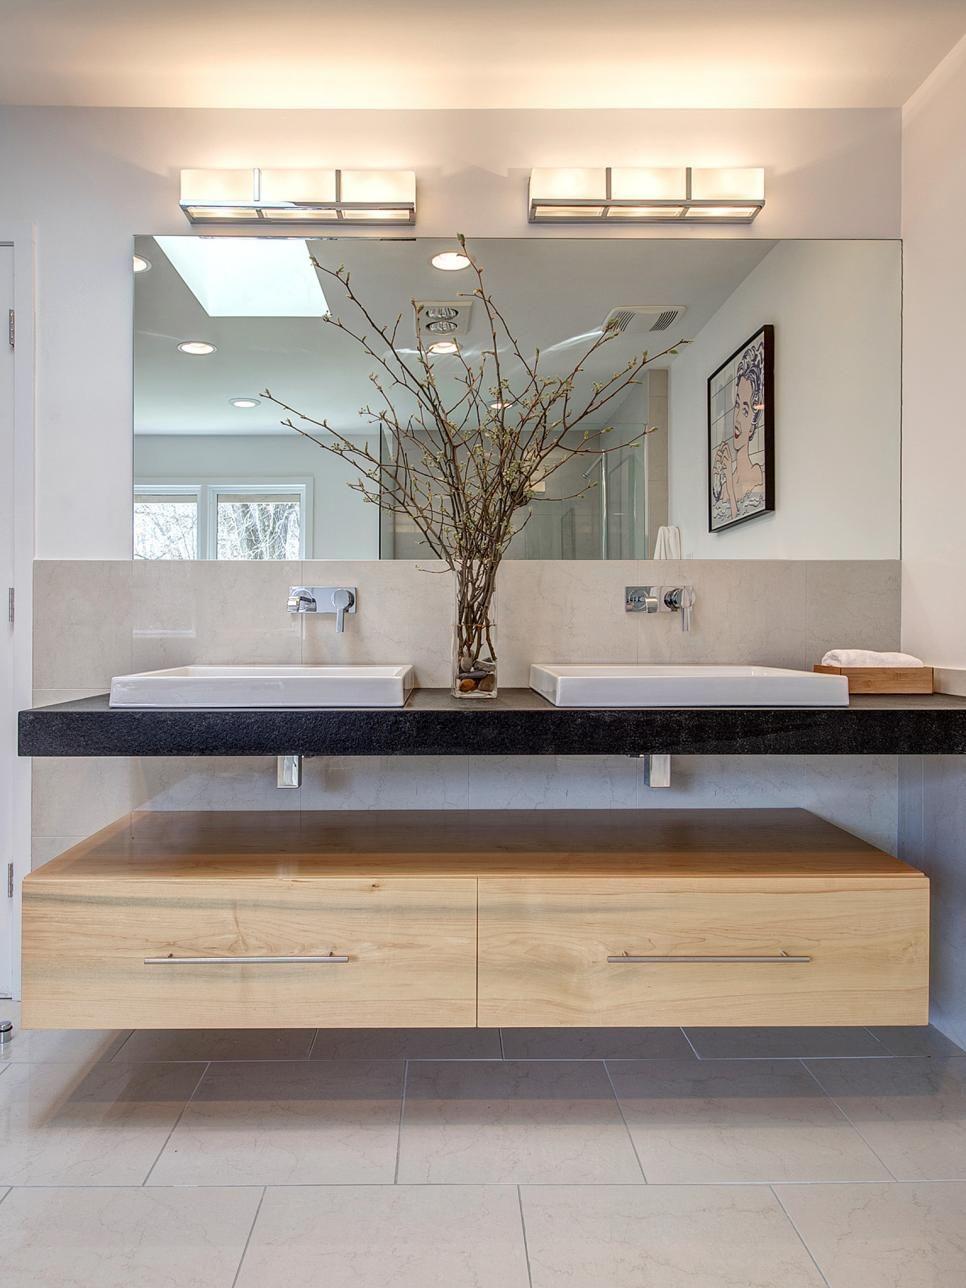 Modern, Sleek Bathroom | More Modern bathroom ideas